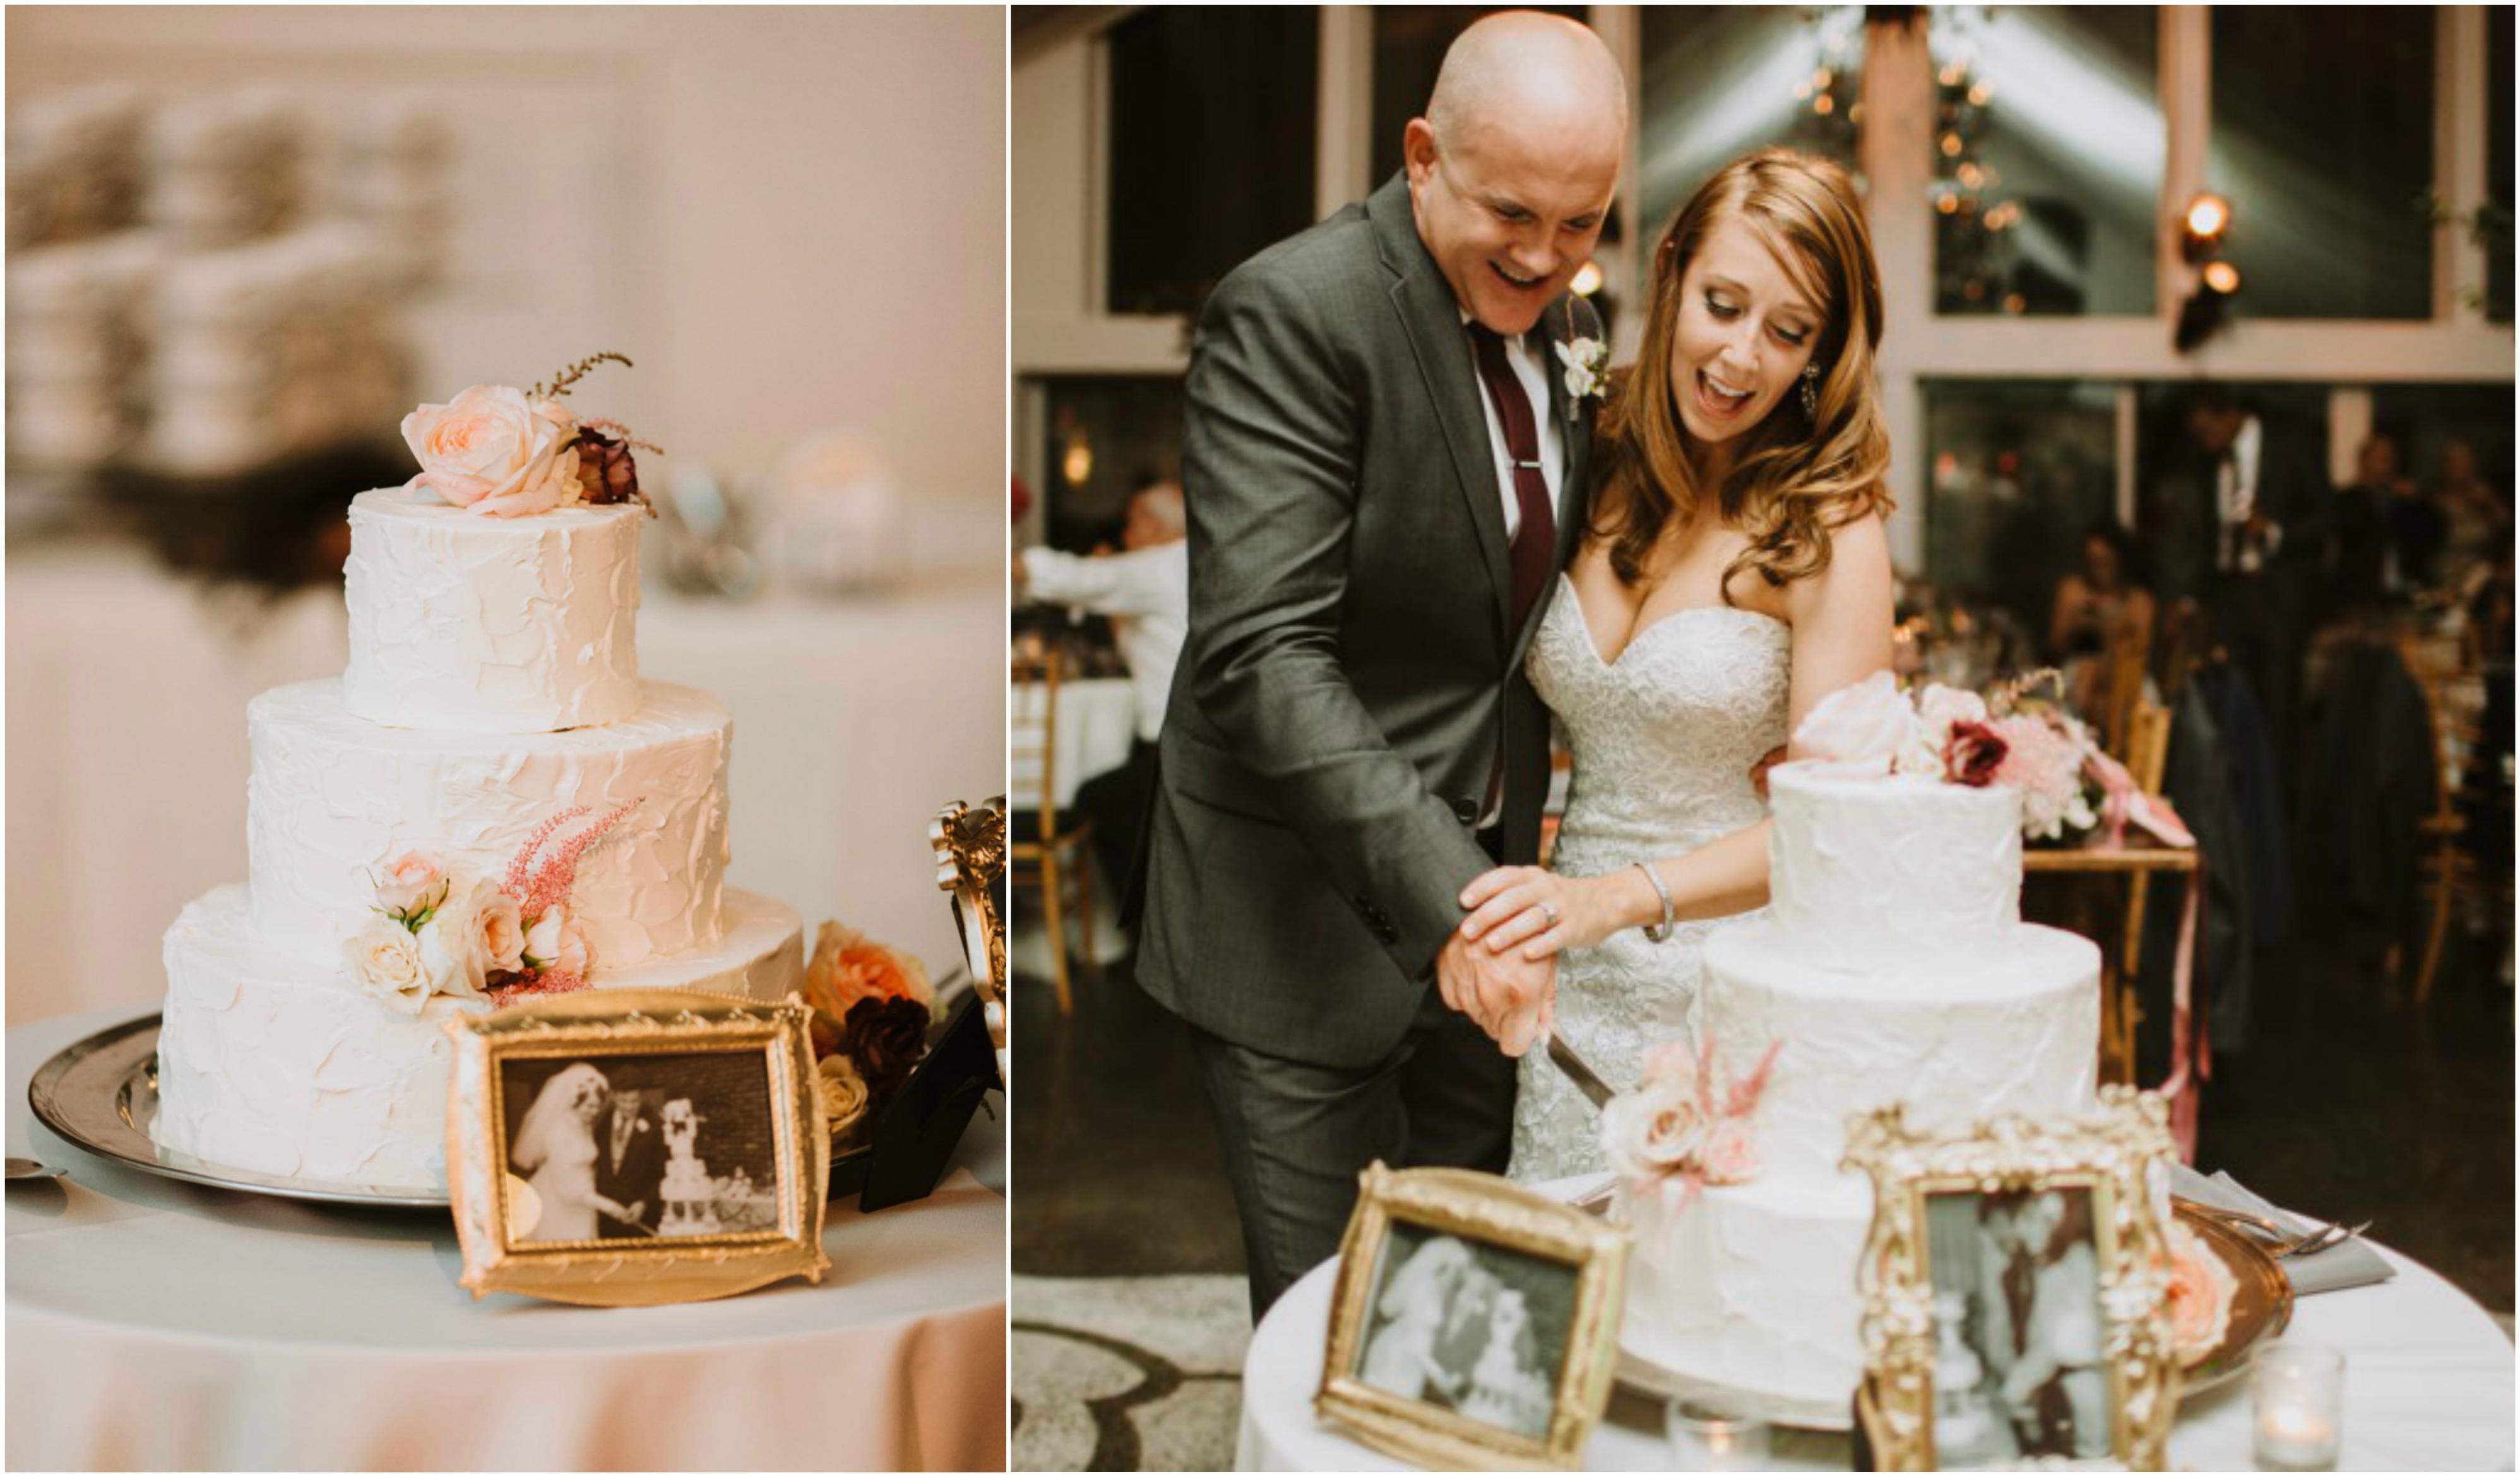 The Lake House Inn Wedding Venue Philly In Love Philadelphia Weddings5